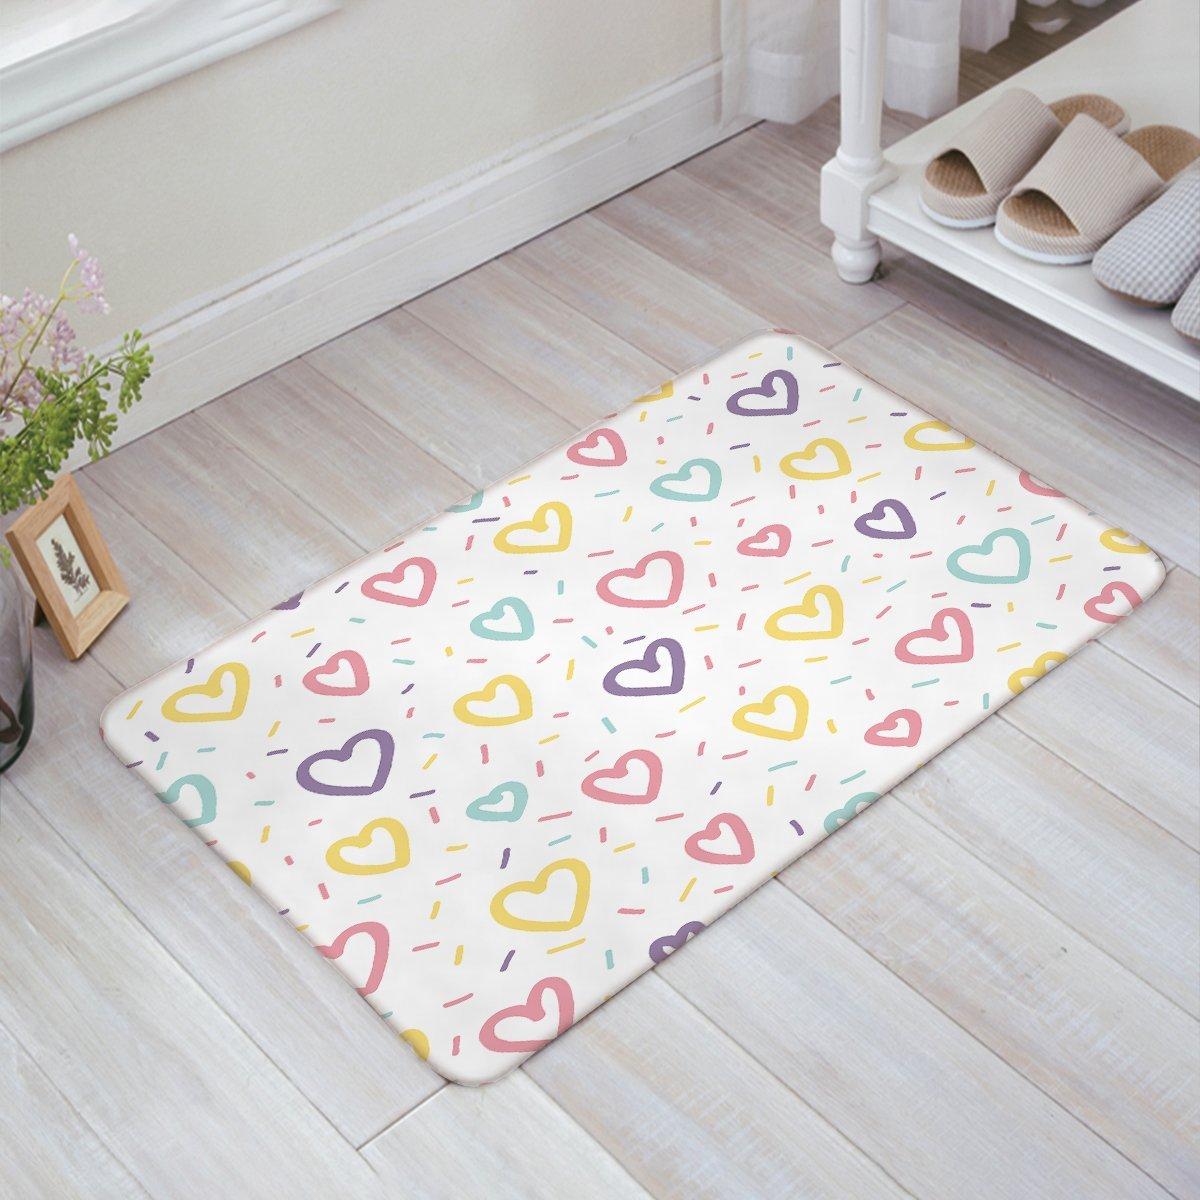 size grey rubber bedroom luxury welcome front main coir mat outdoor teal entrance small mats door of doormat indoor design colorful cool long full patterned